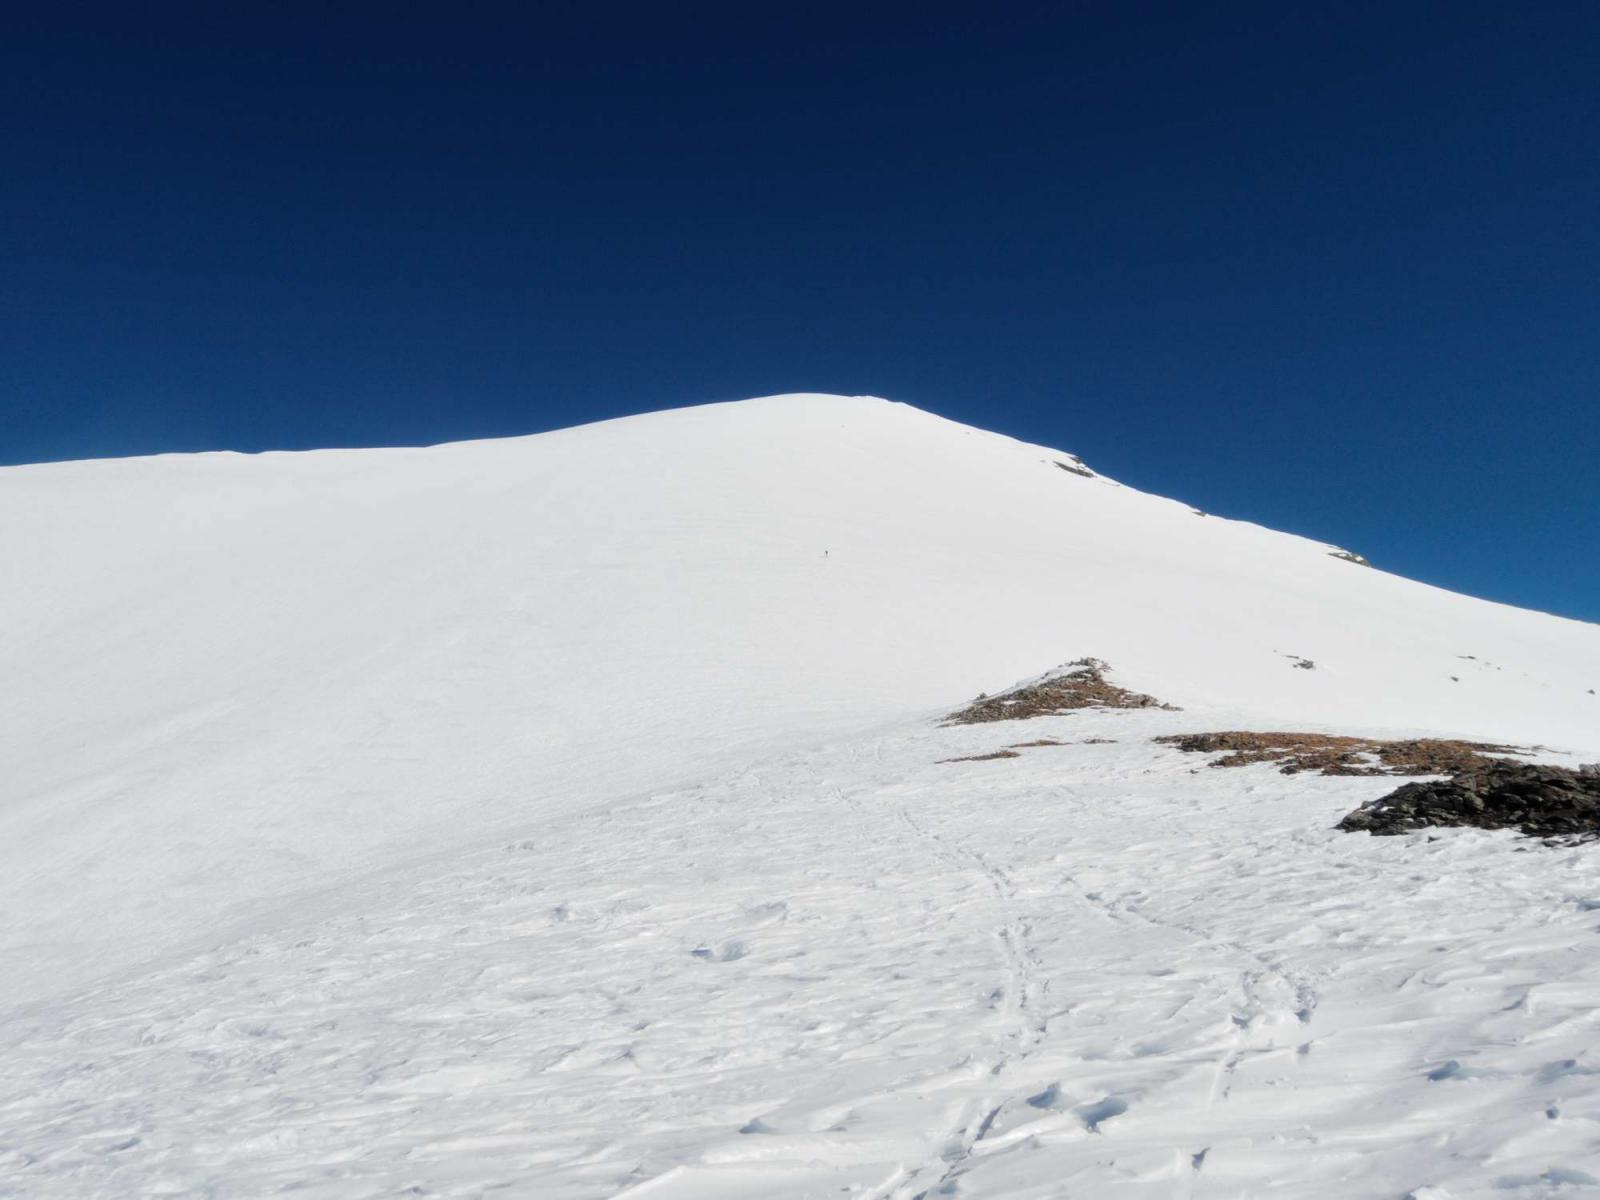 Pioltone (Pizzo) o Camoscellahorn da San Bernardo 2014-03-09